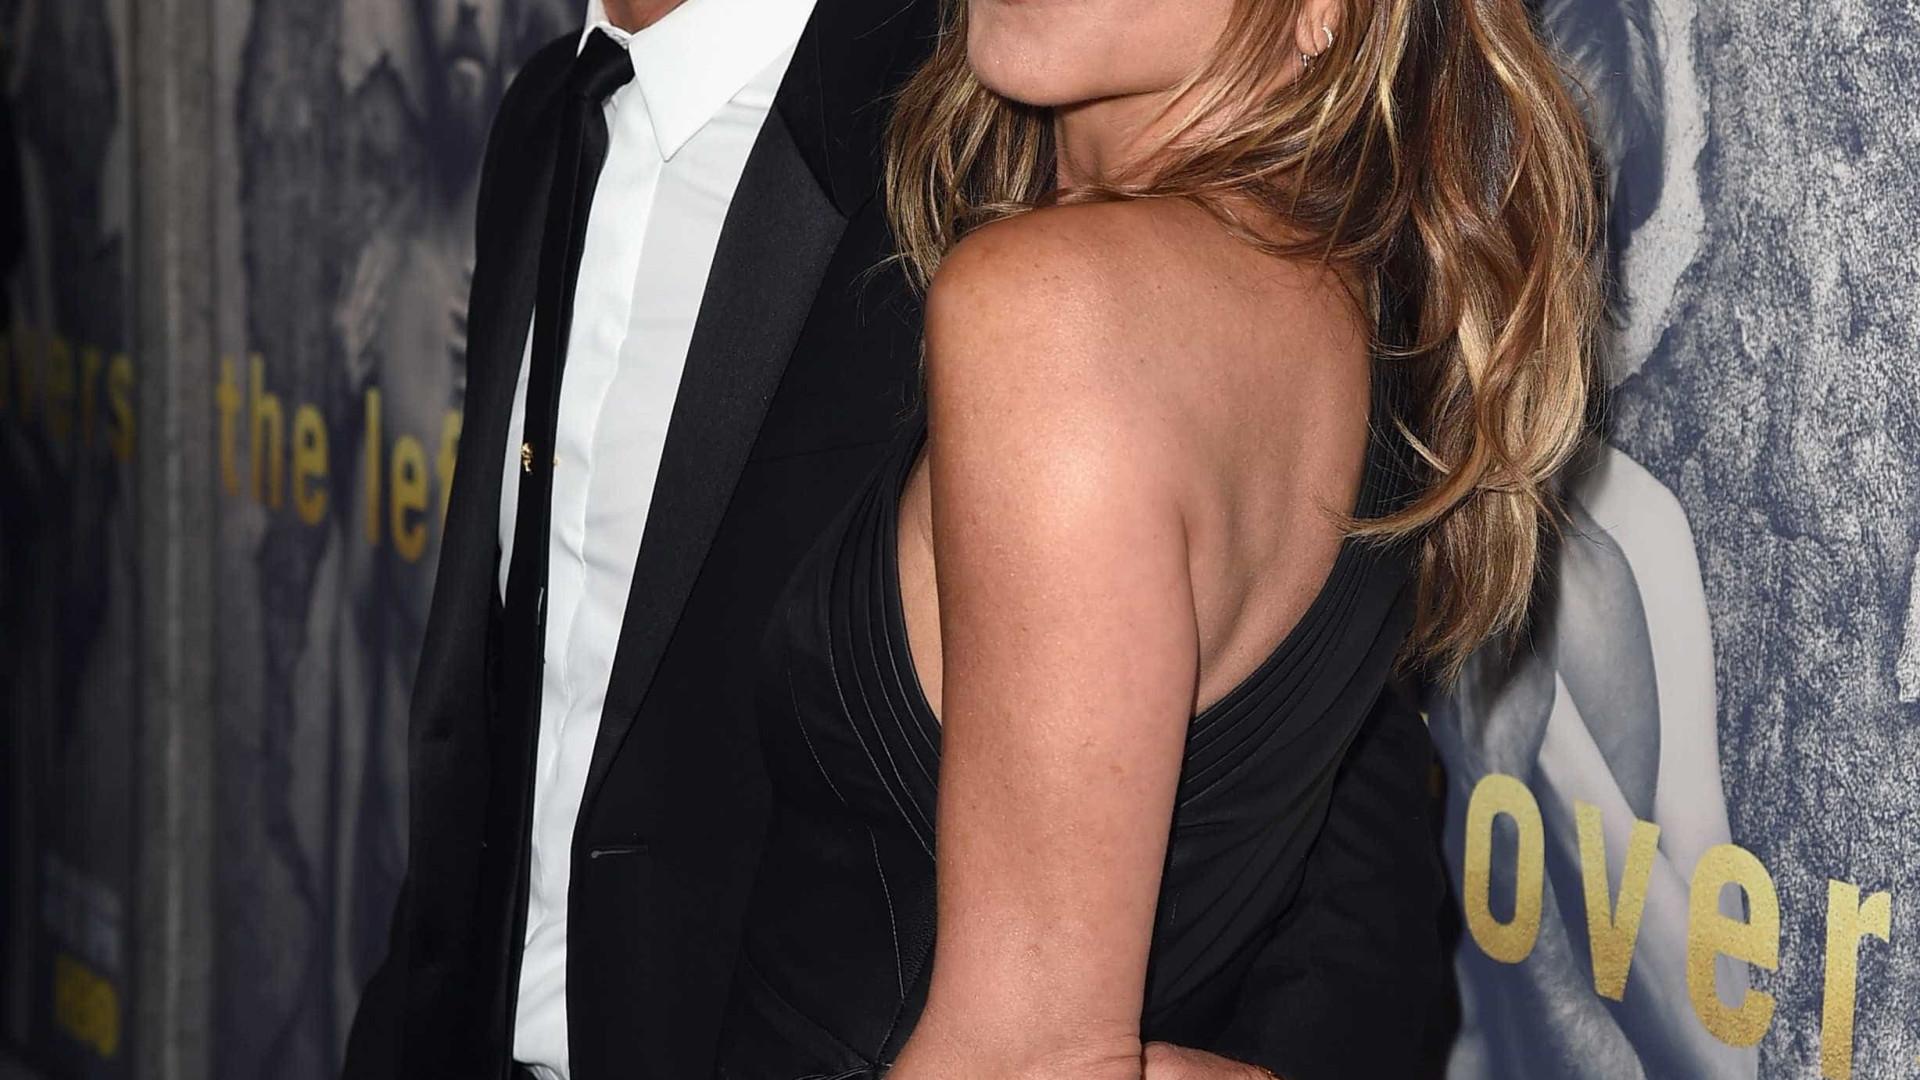 Saídas noturnas motivaram o divórcio de Jennifer Aniston e Justin Theroux